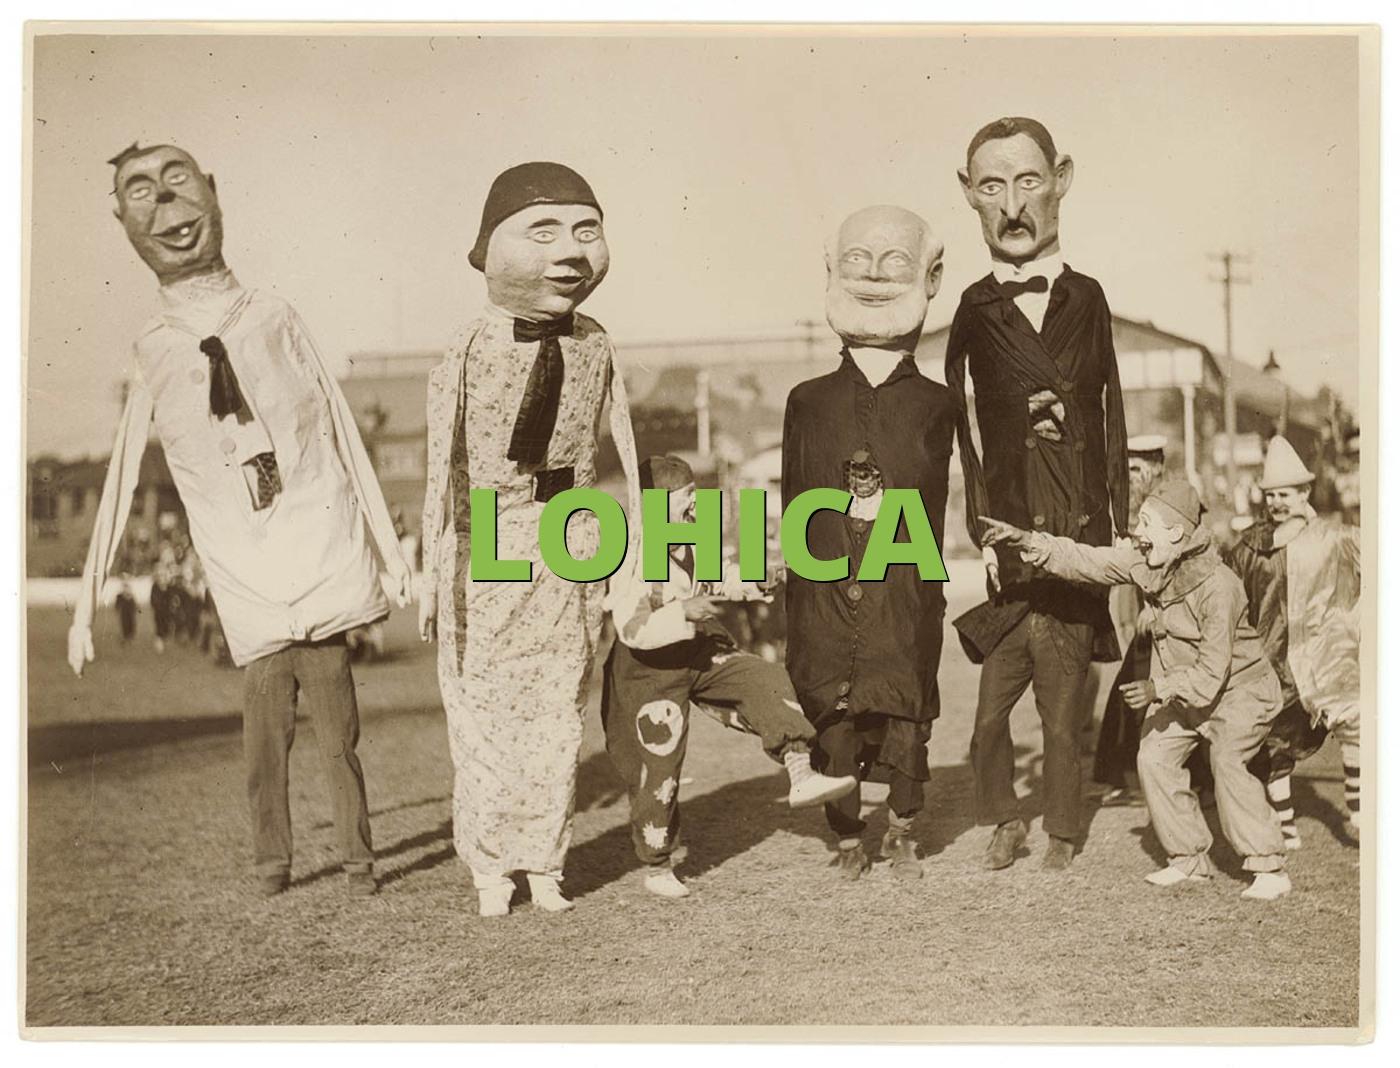 LOHICA